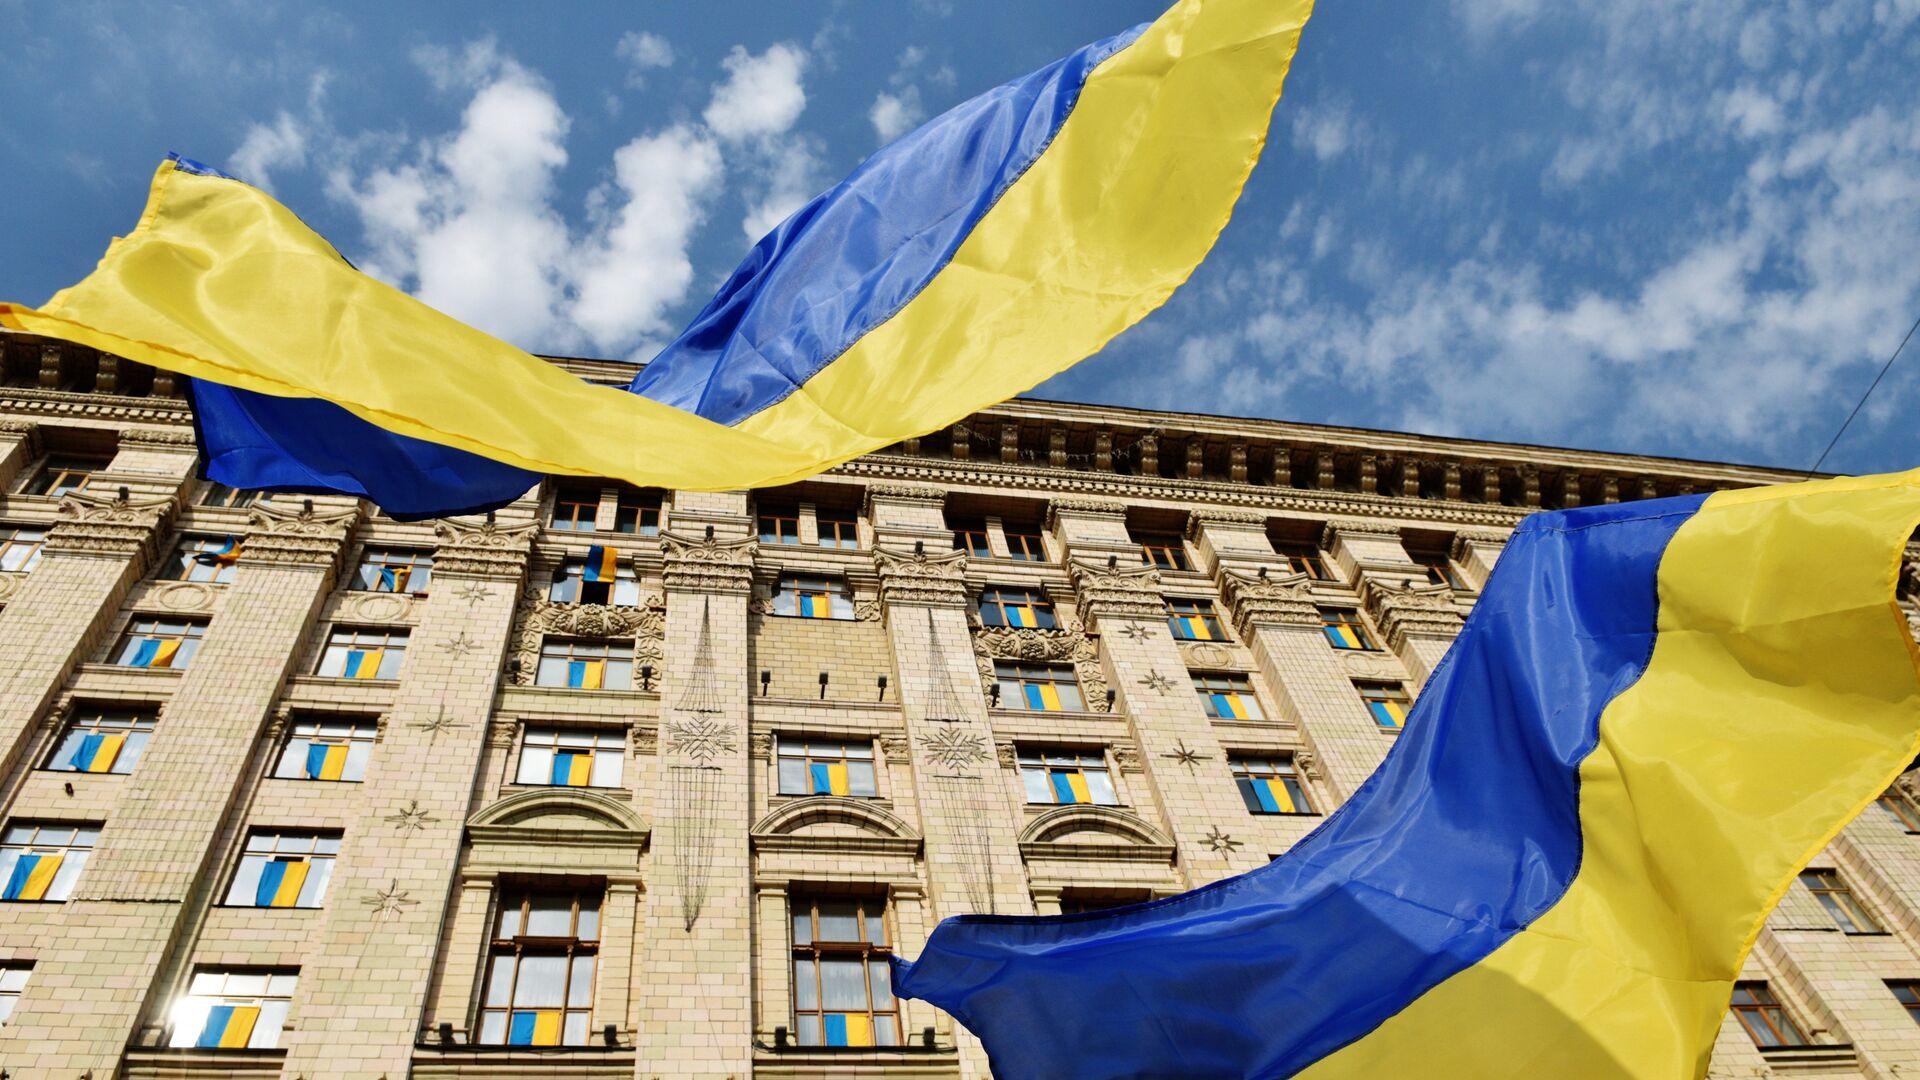 Bandera de Ucrania (archivo) - Sputnik Mundo, 1920, 04.08.2021